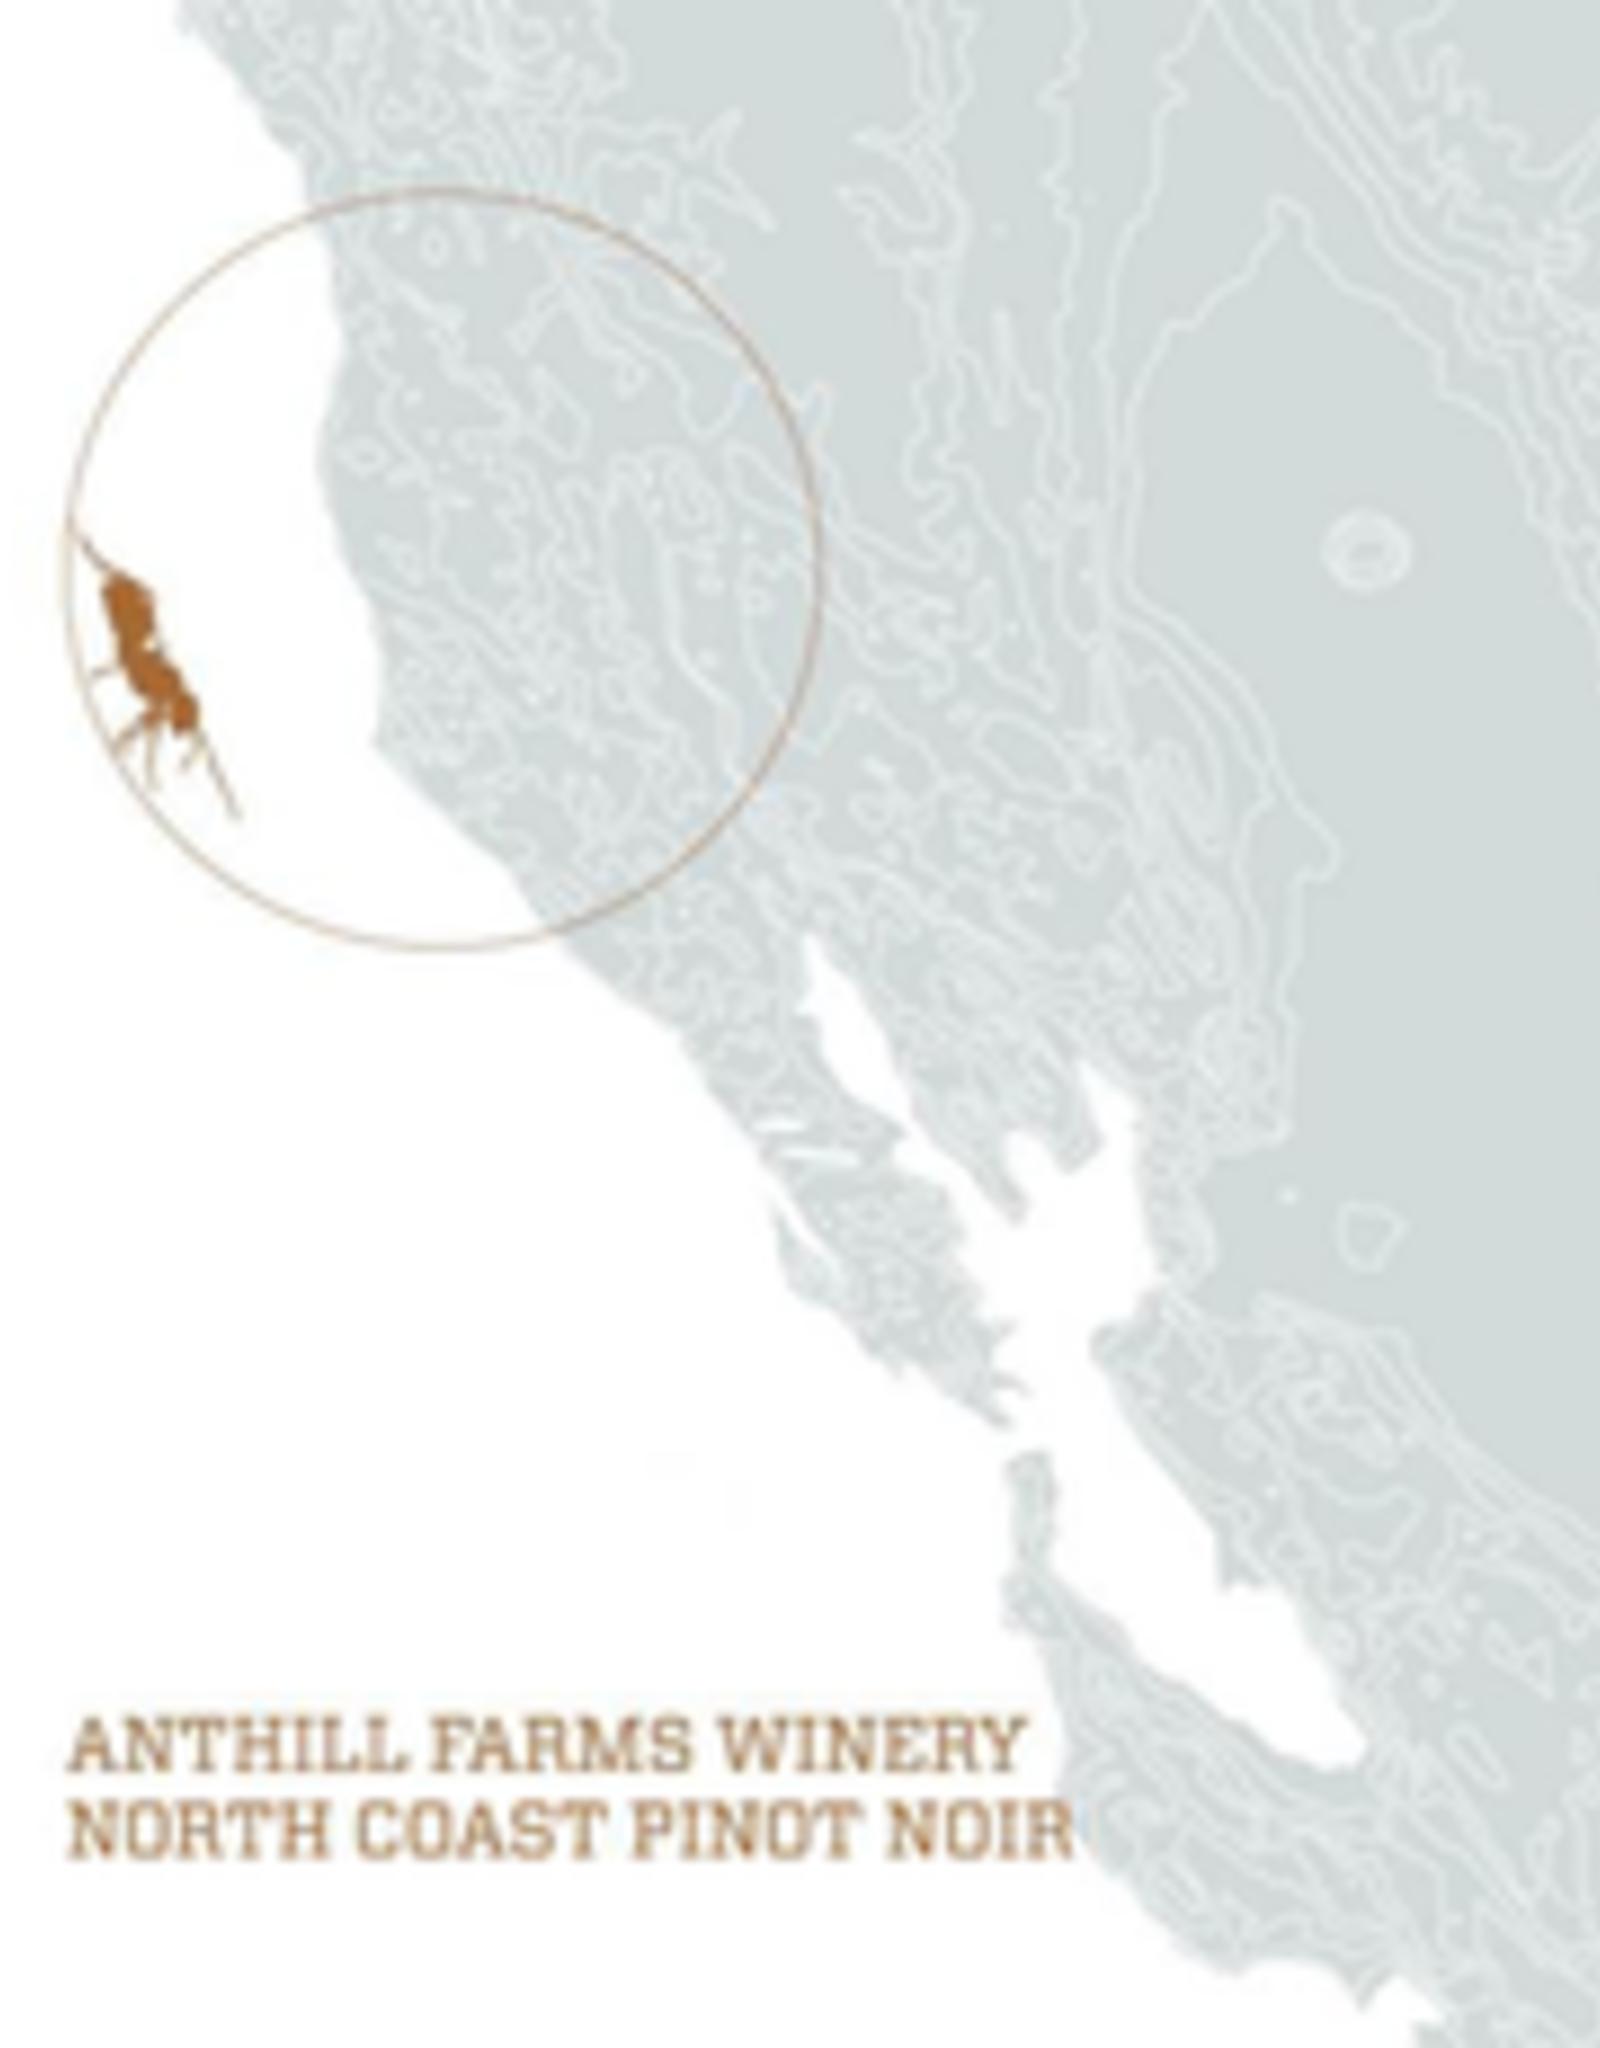 Pinot Noir, North Coast, Anthill Farms NV